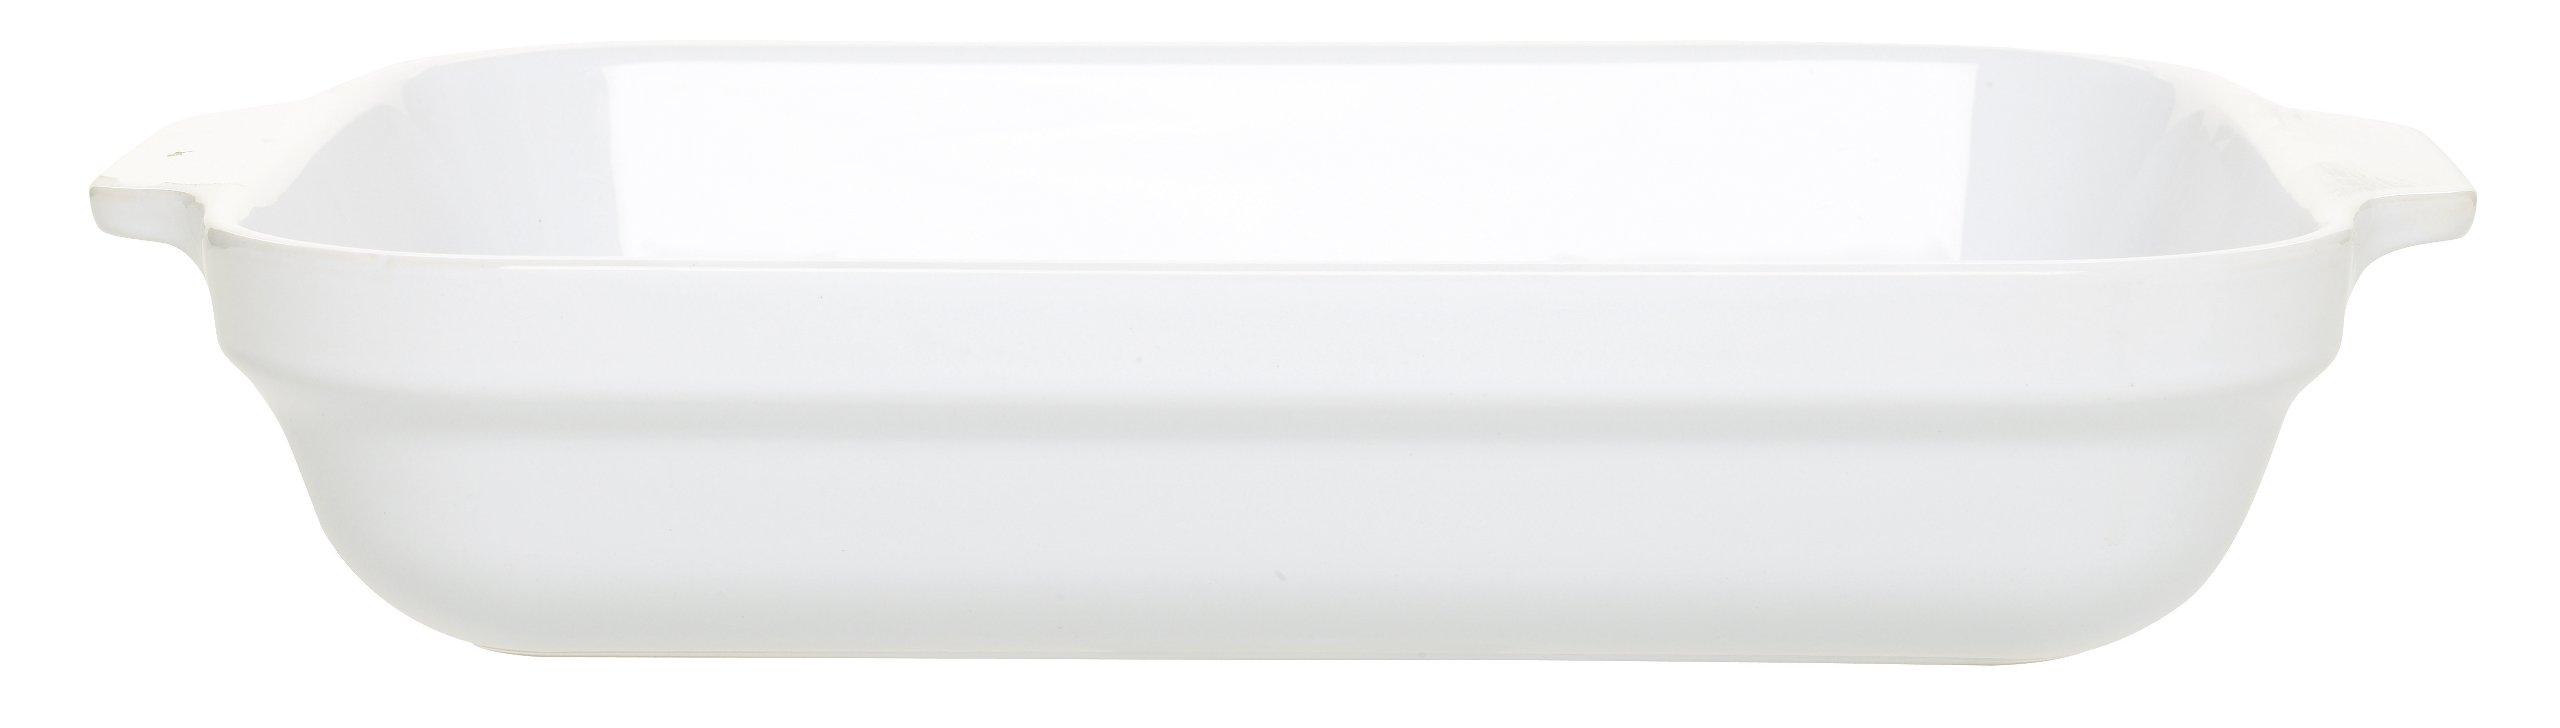 Emile Henry 13-by-10-Inch Lasagna Baker, White